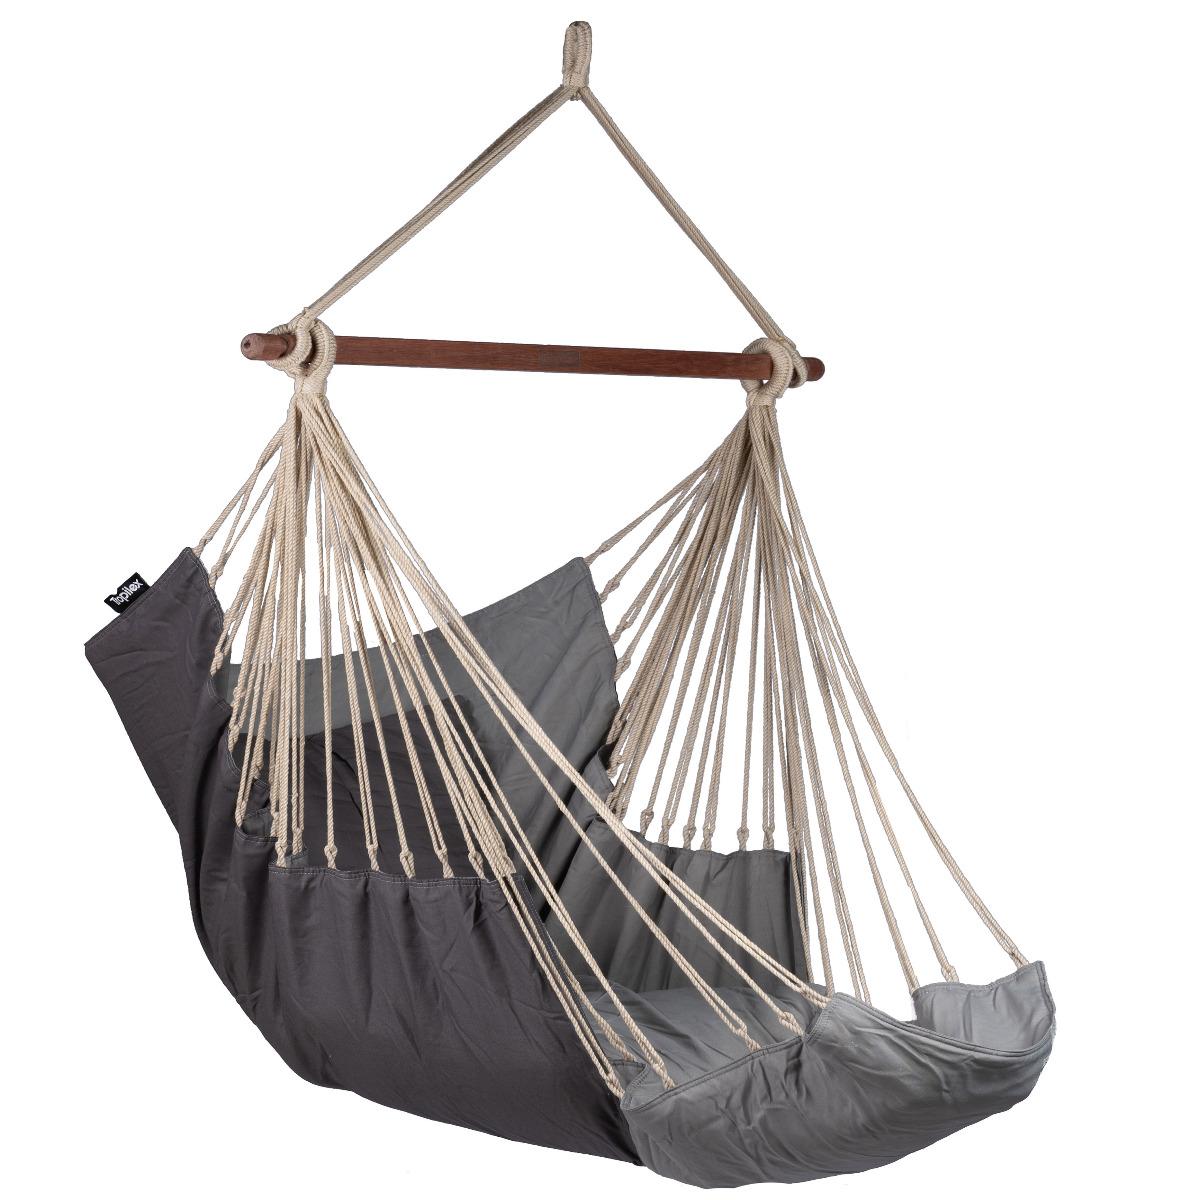 Hangstoel 'Sereno' Grey - Tropilex �